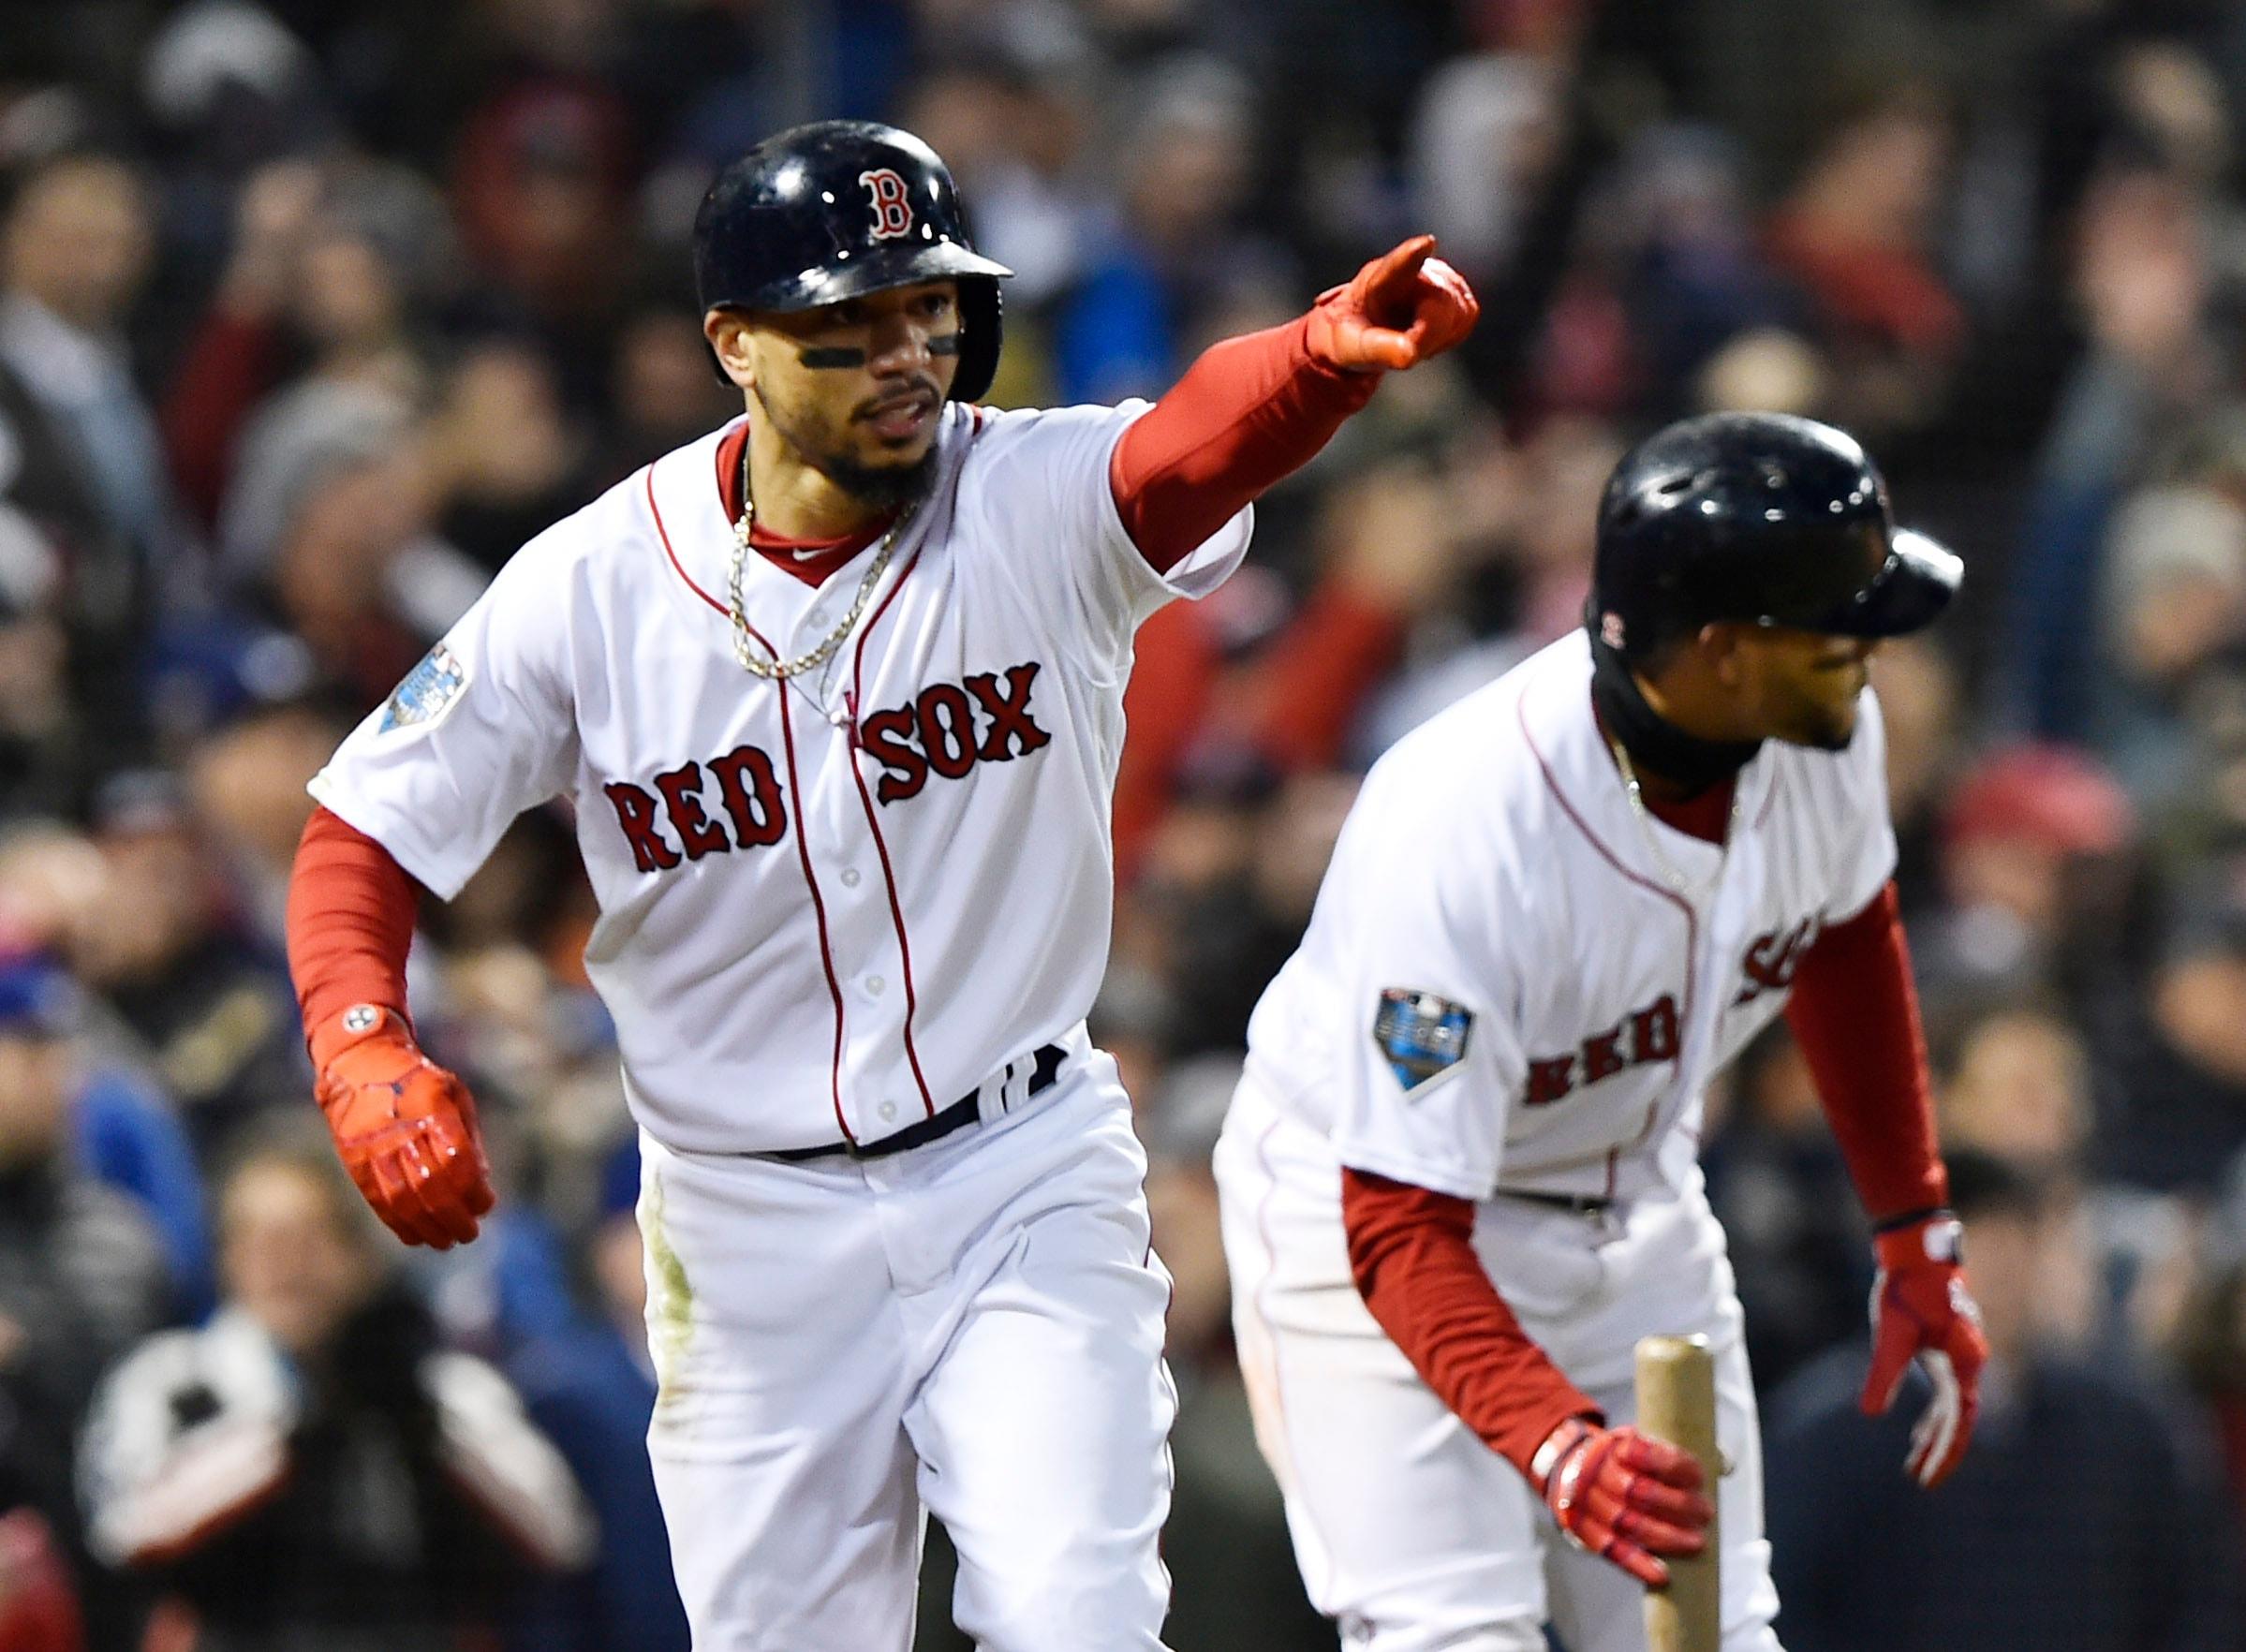 MLB Rumors: Red Sox, Dodgers have begun Mookie Betts trade talks